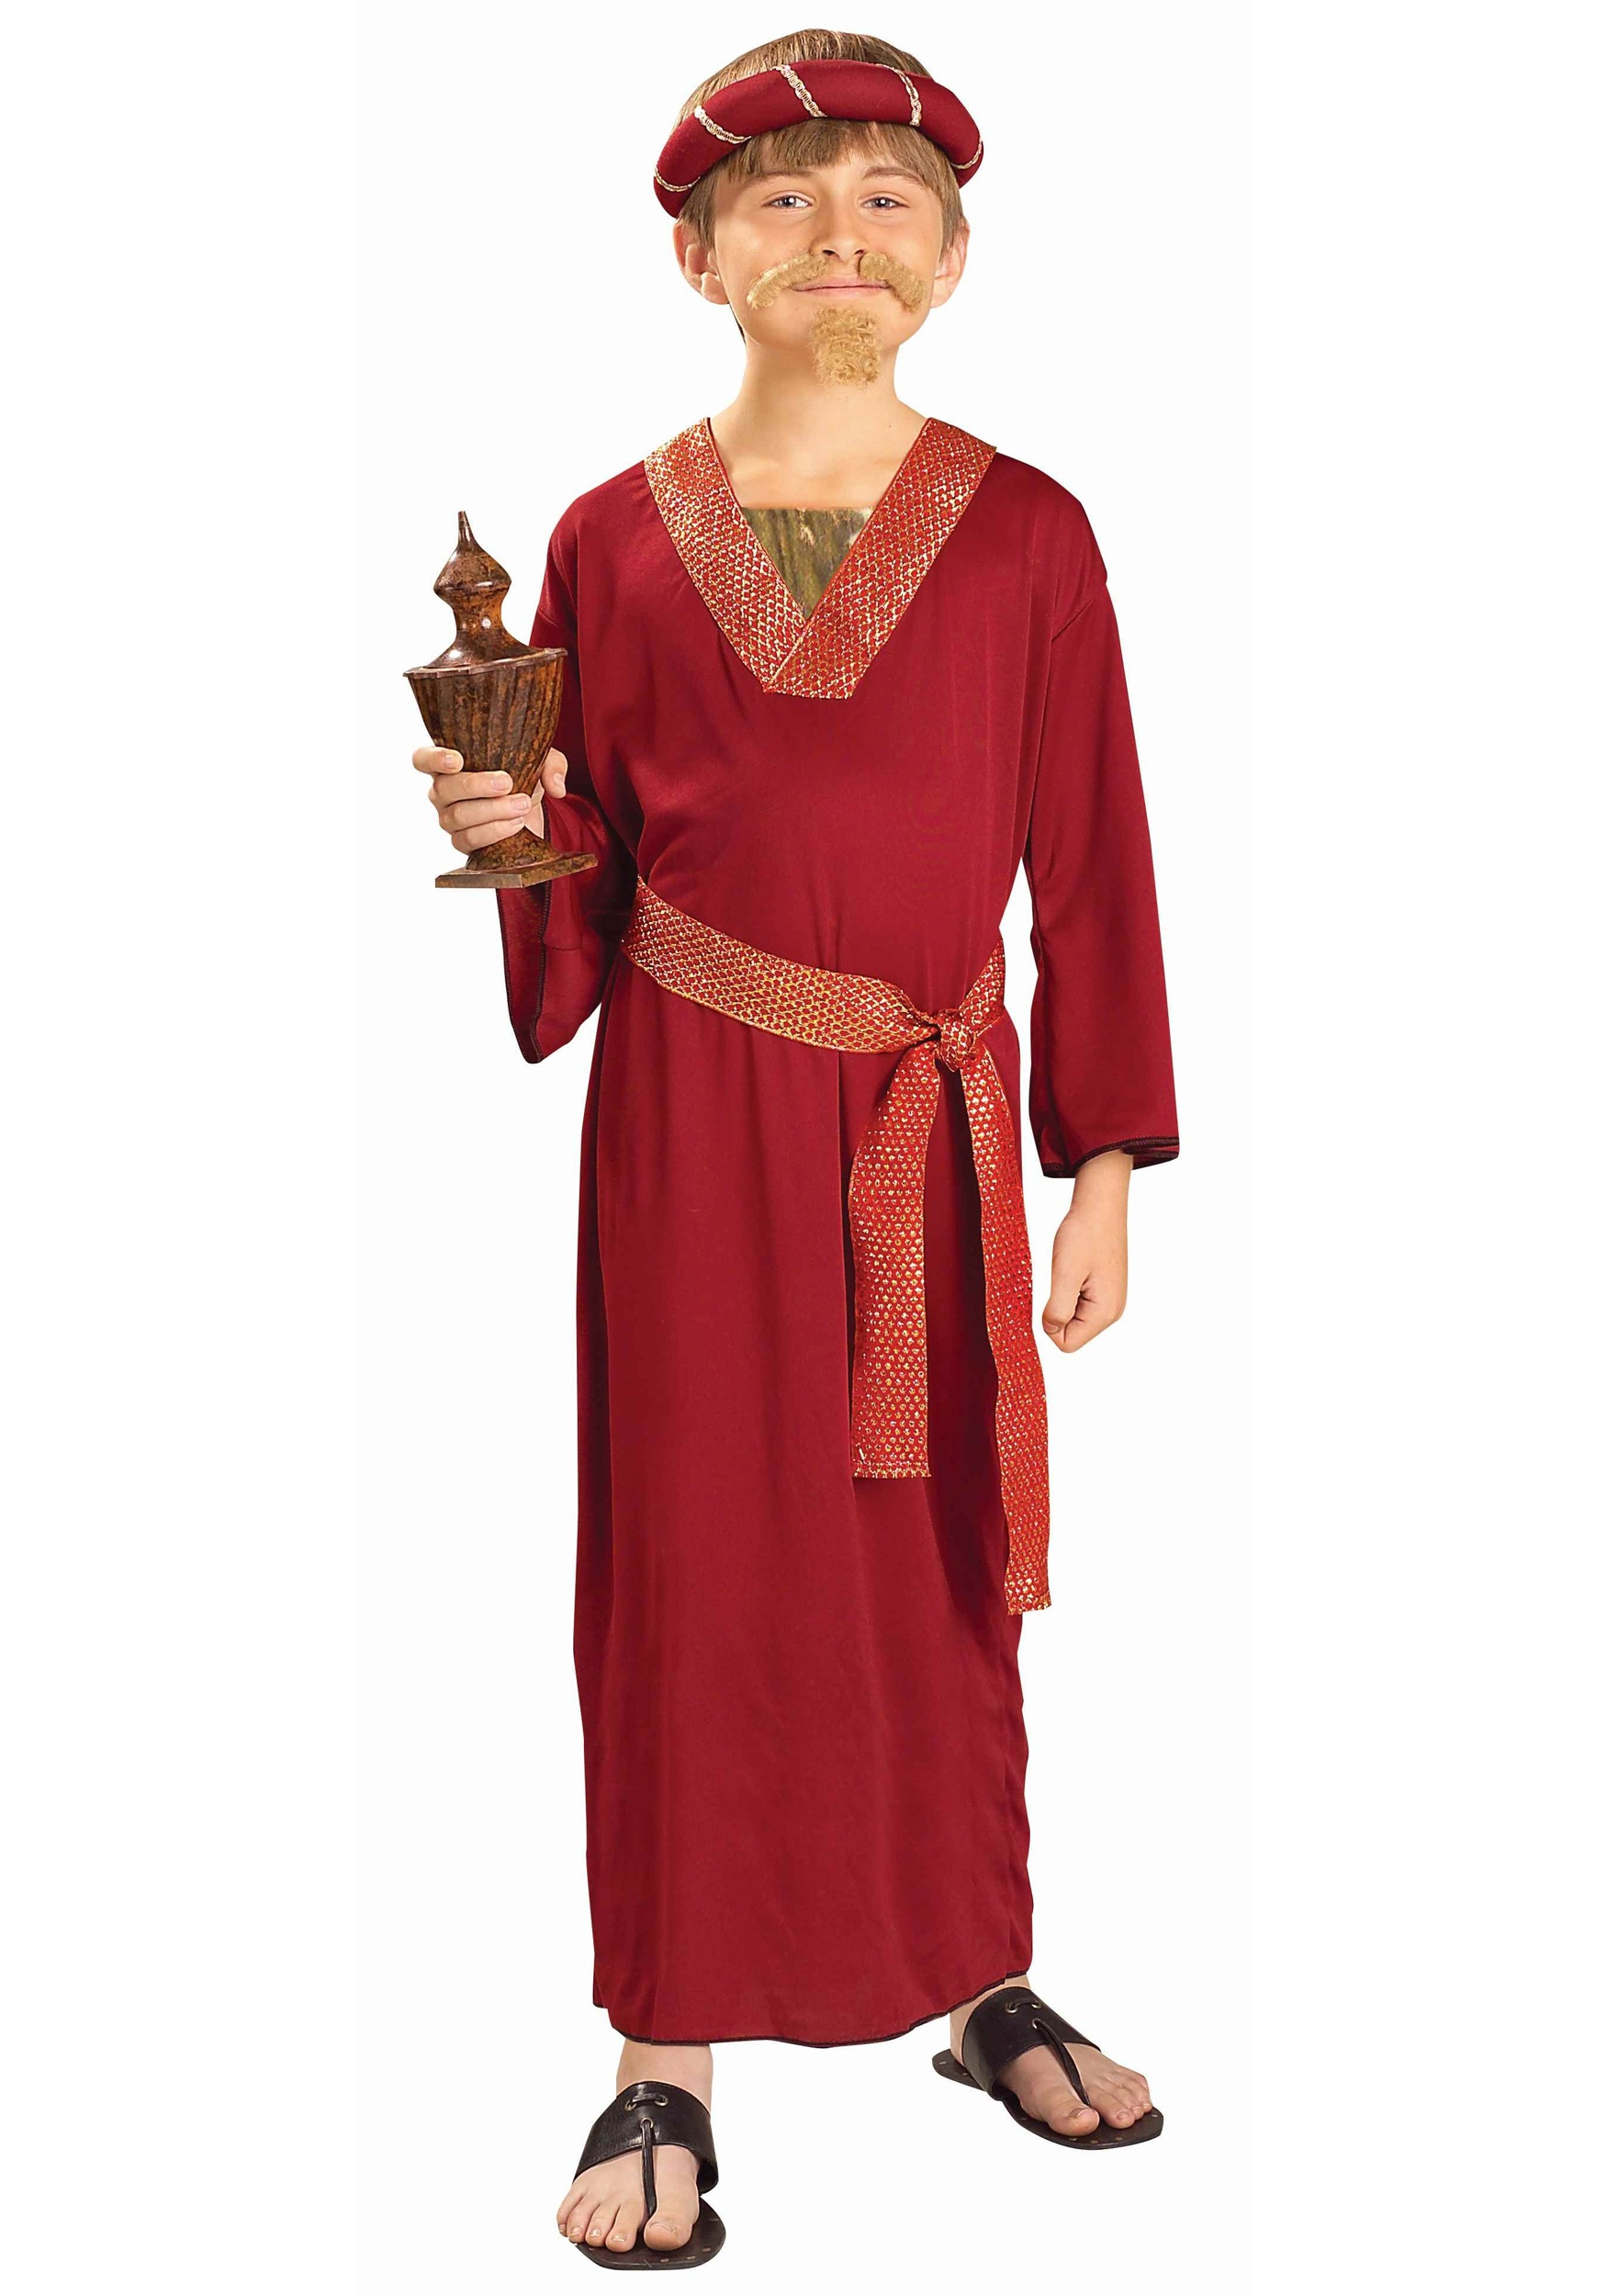 Child Biblical Wiseman Costume  sc 1 st  Halloween Costumes & Child Biblical Wiseman Costume - Halloween Costumes